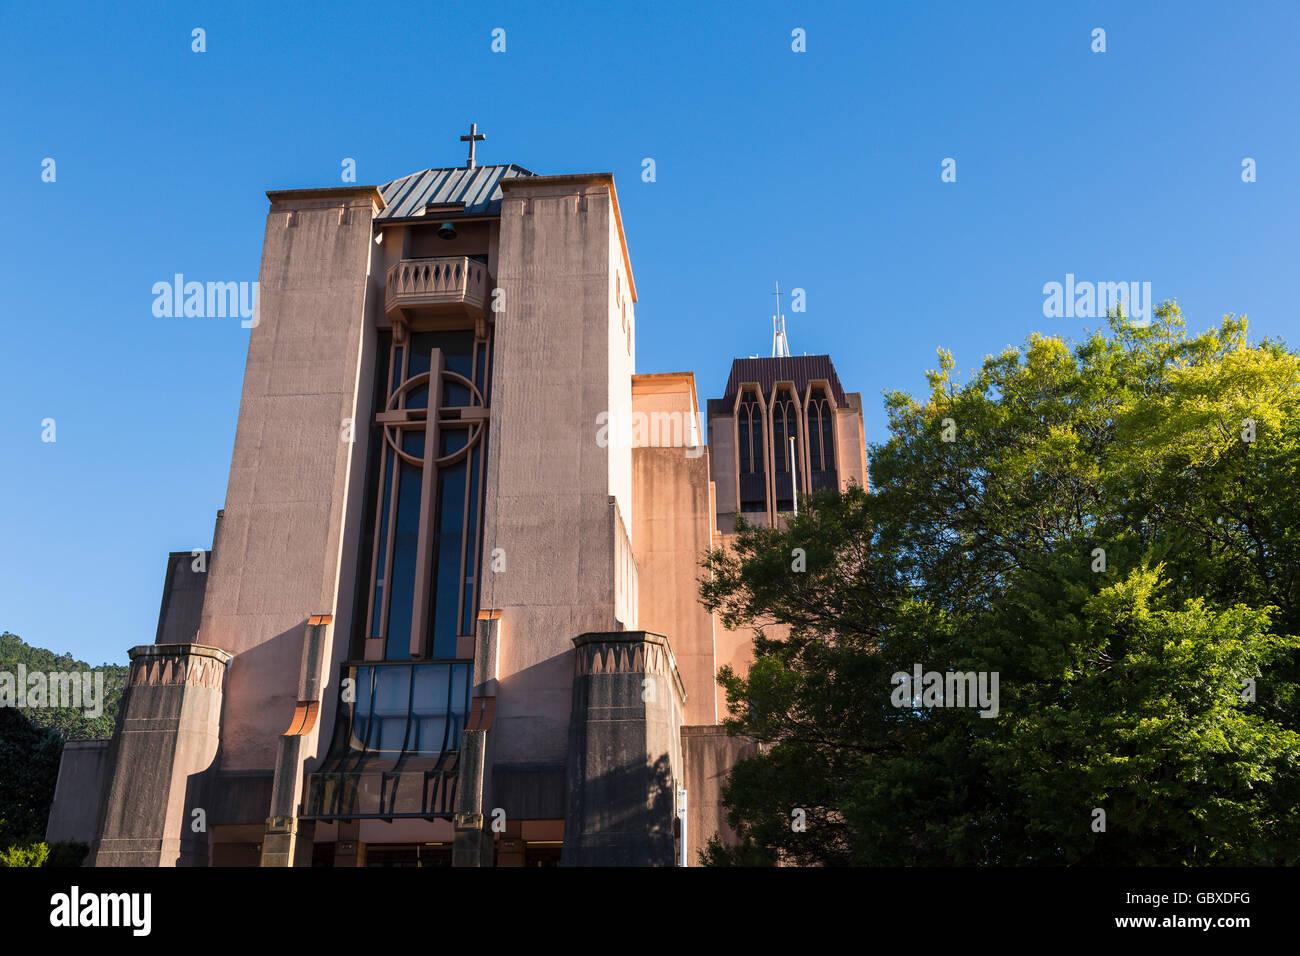 St Pauls cathedral, Wellington, New Zealand Stock Photo